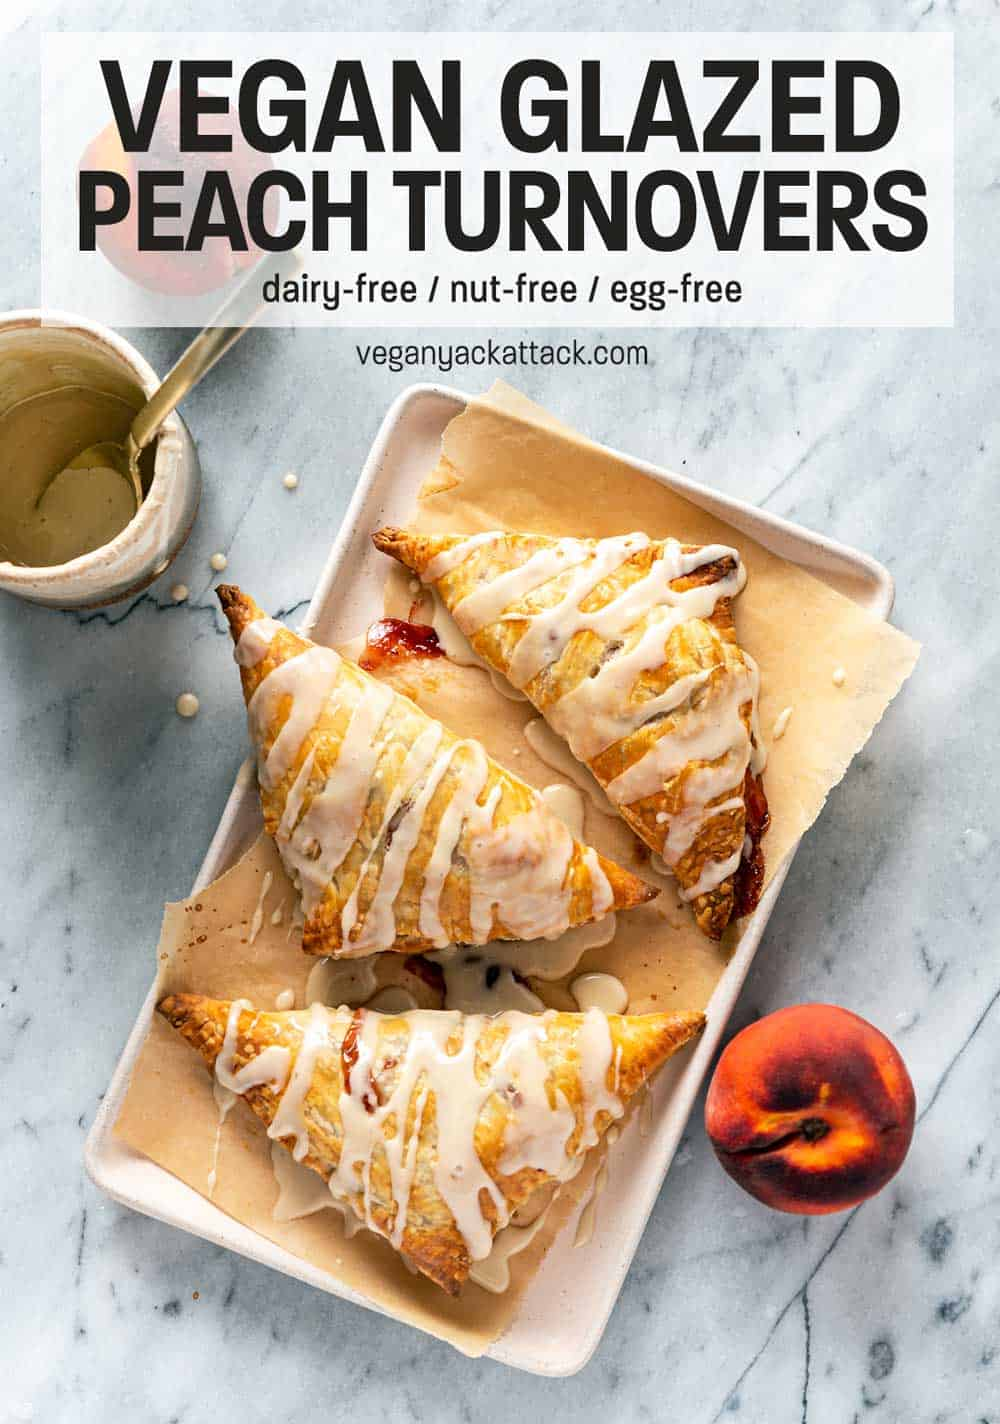 Three vegan peach turnovers on a rectangular plate